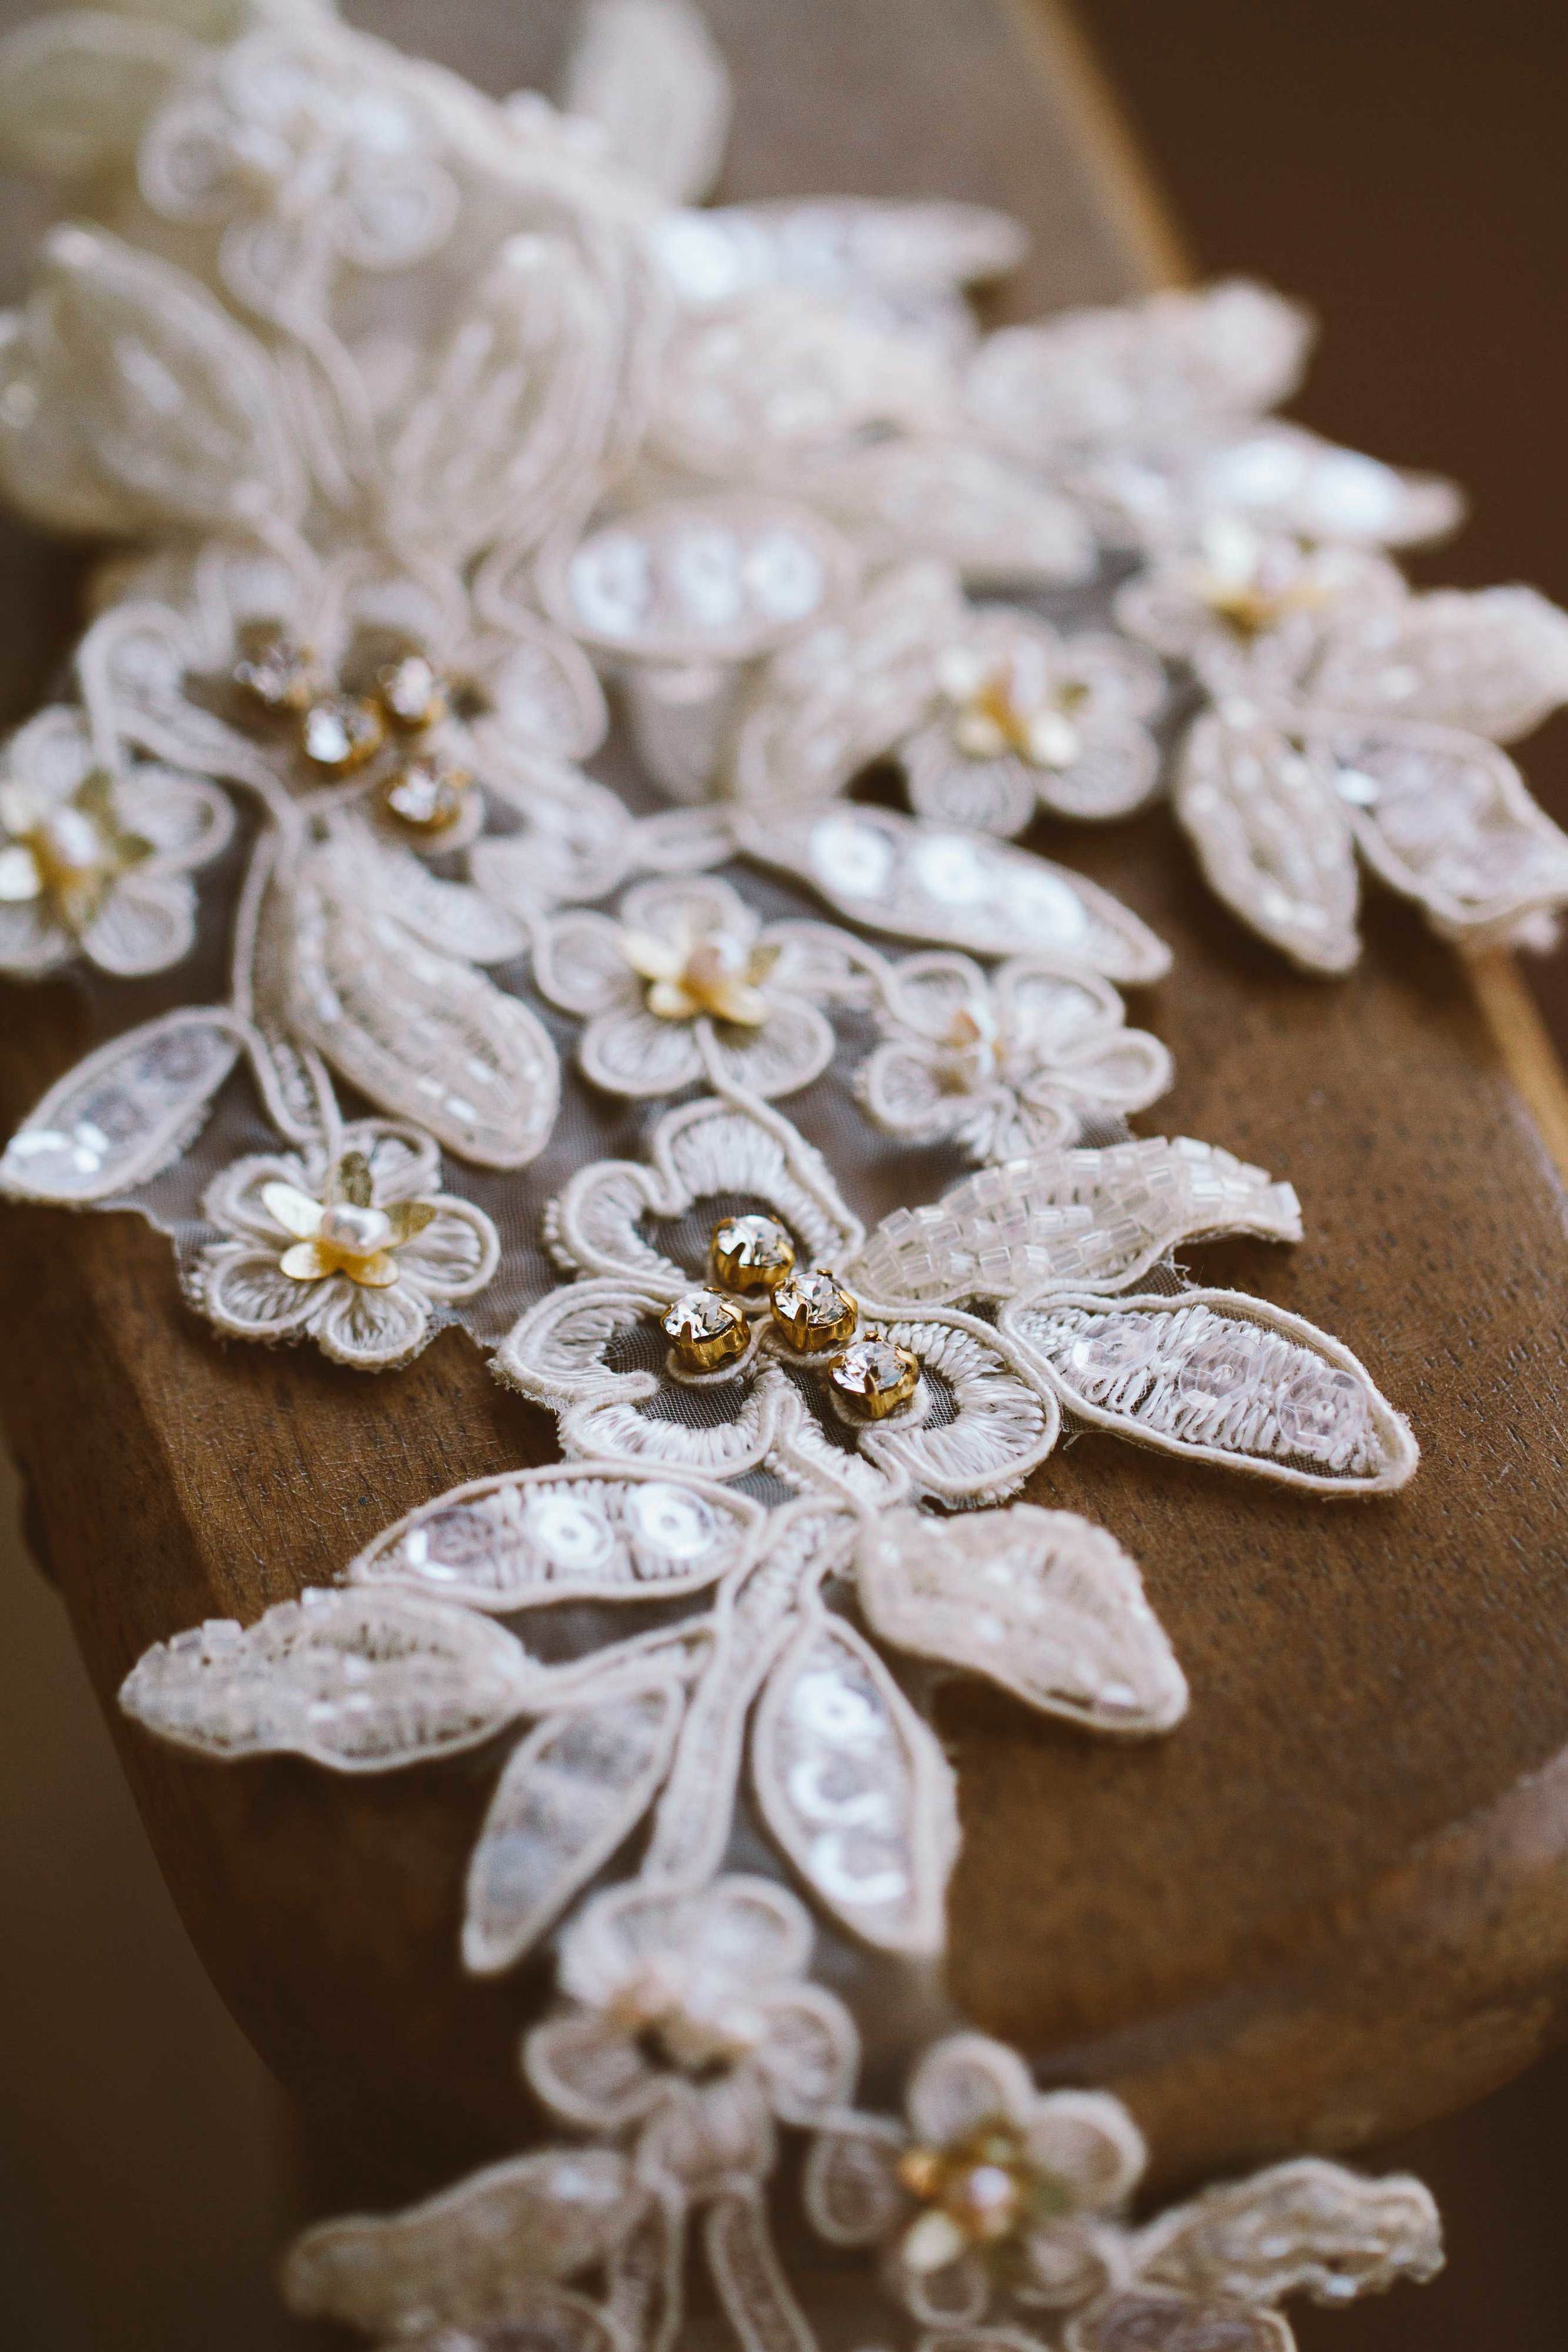 Radka-Wedding-Radka-April-18-2015-0020.jpg